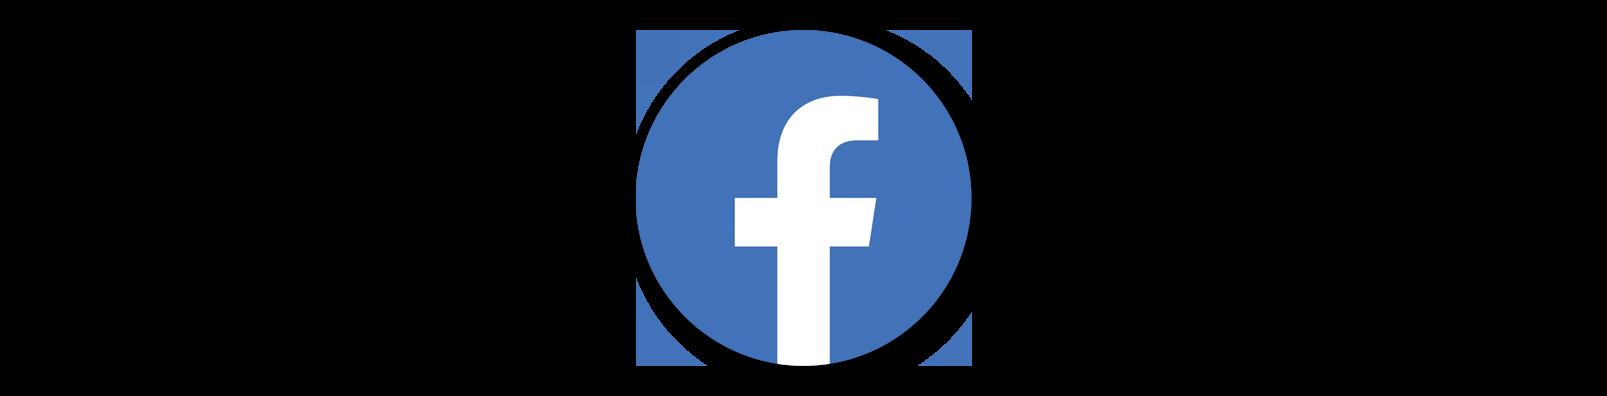 Facebook Potloc